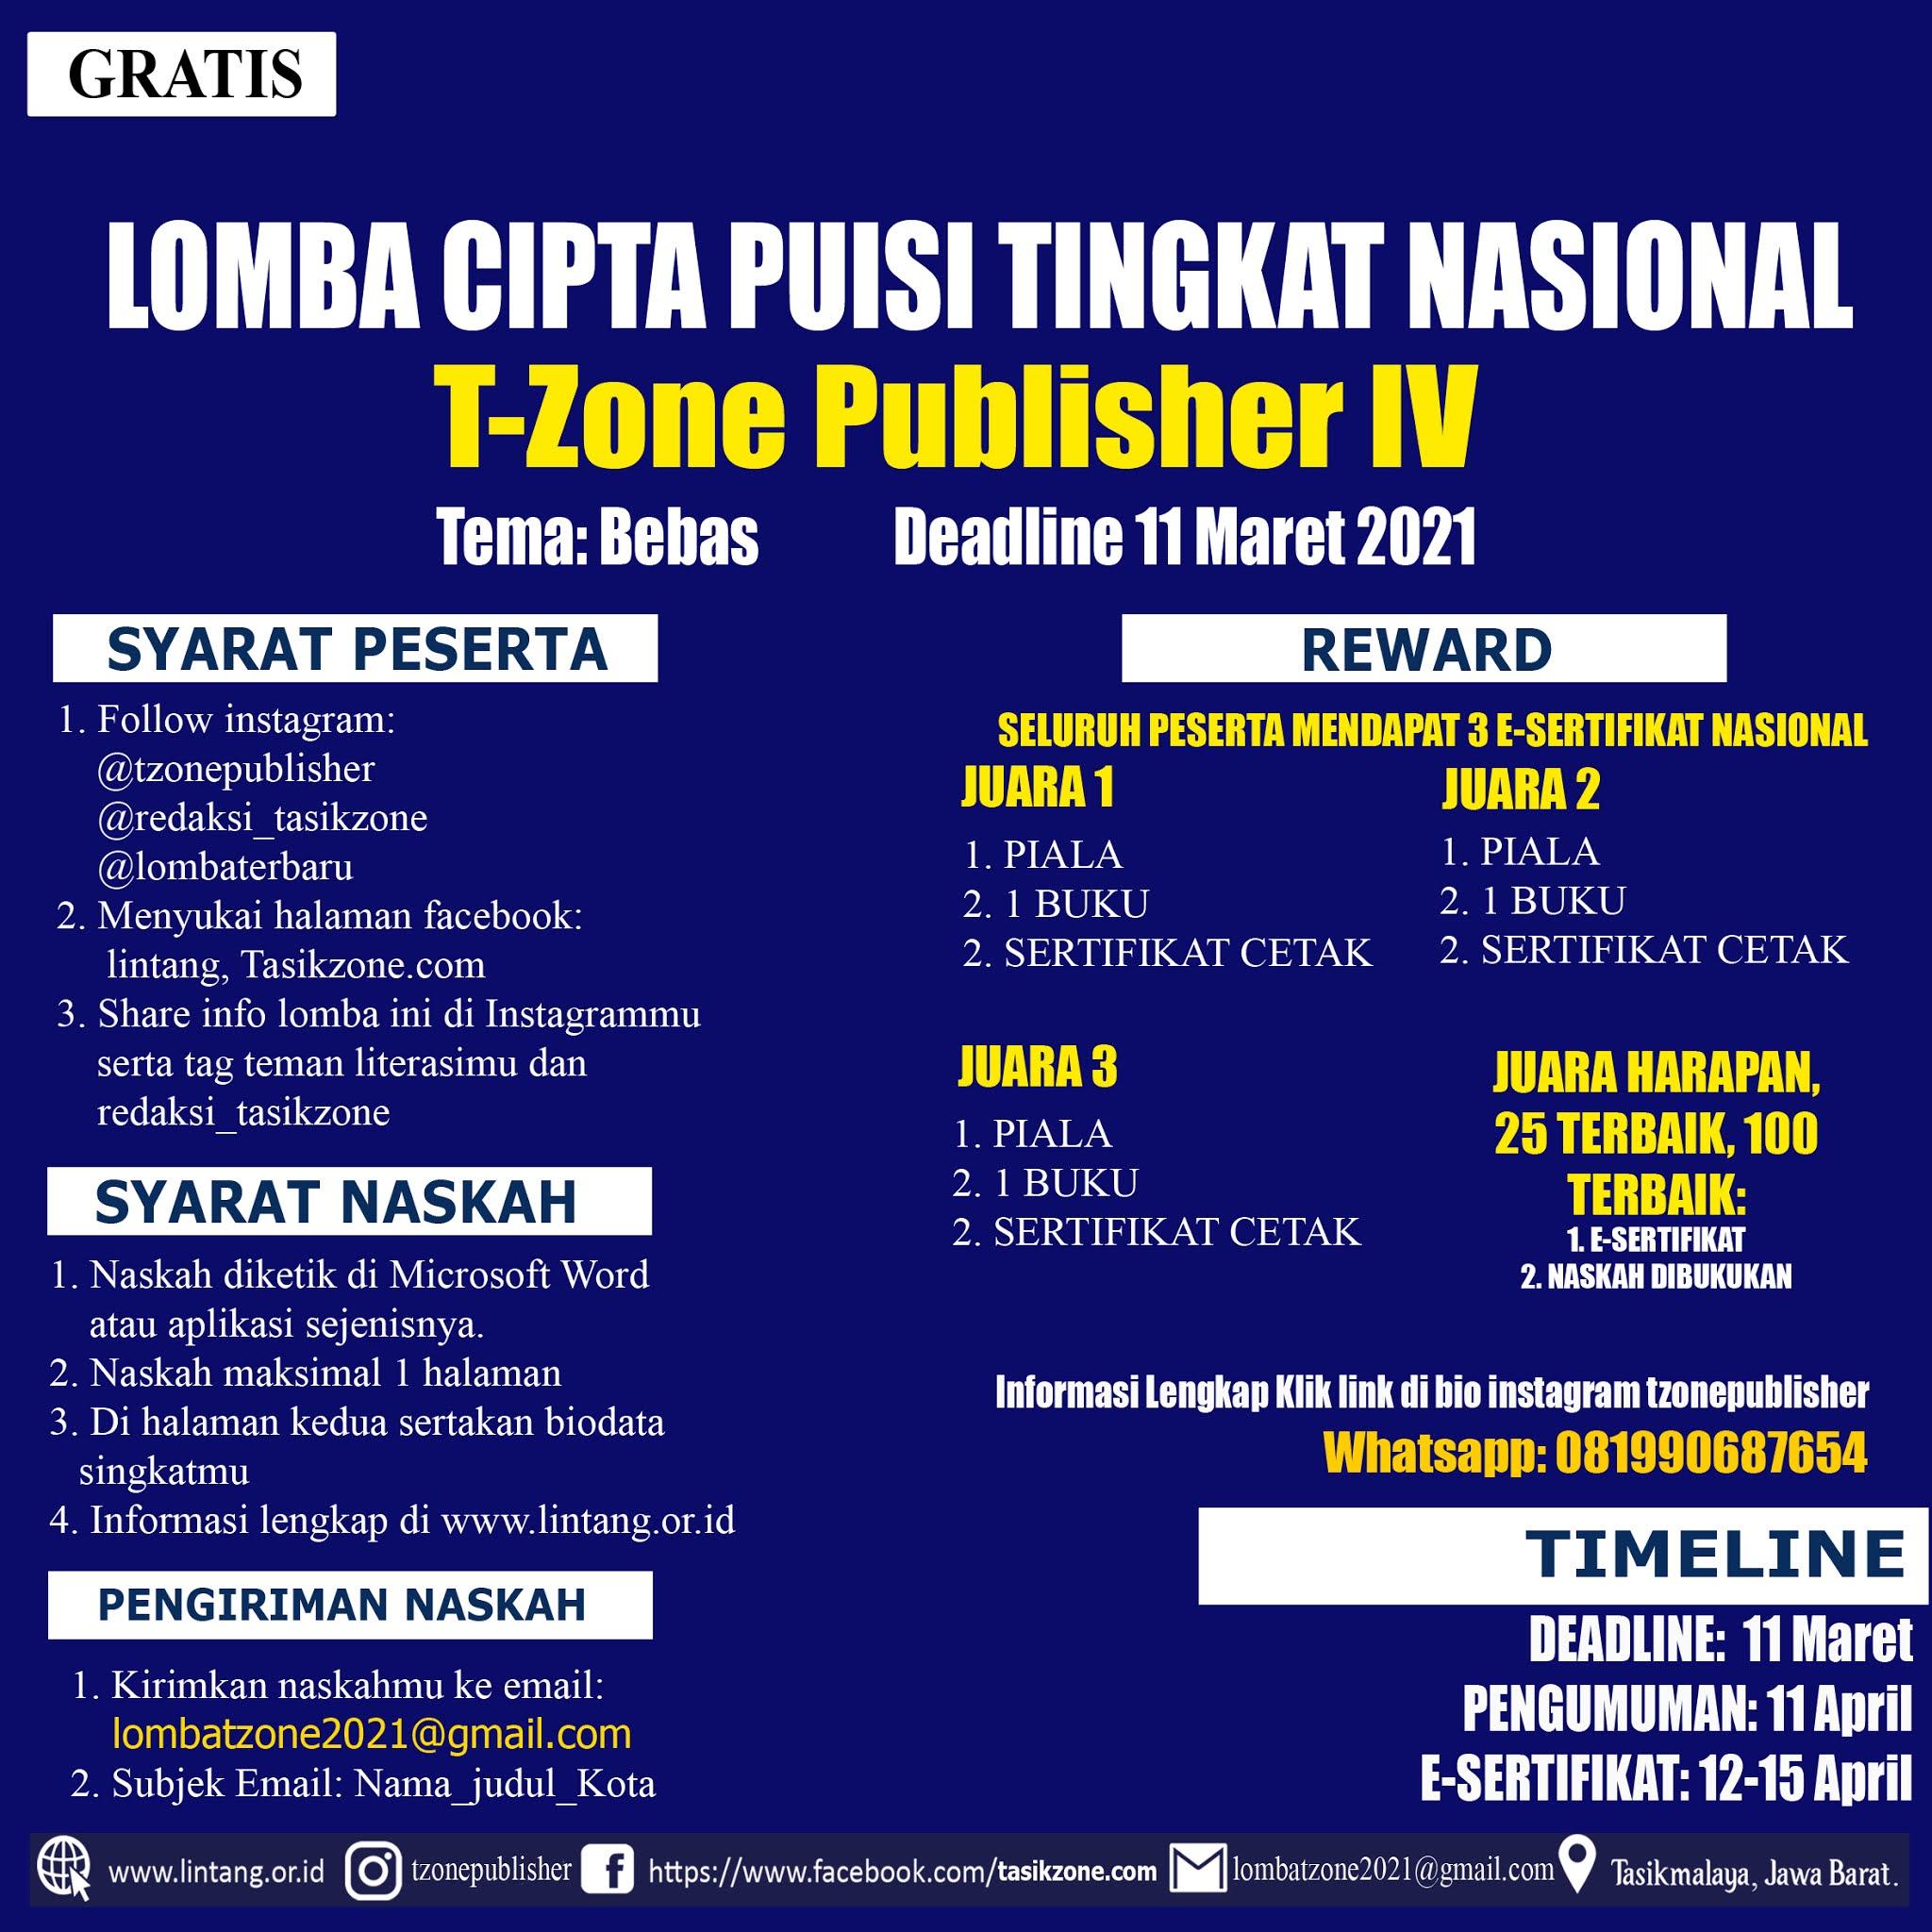 LOMBA CIPTA PUISI TINGKAT NASIONAL TZONE PUBLISHER DEADLINE 11 MARET 2021